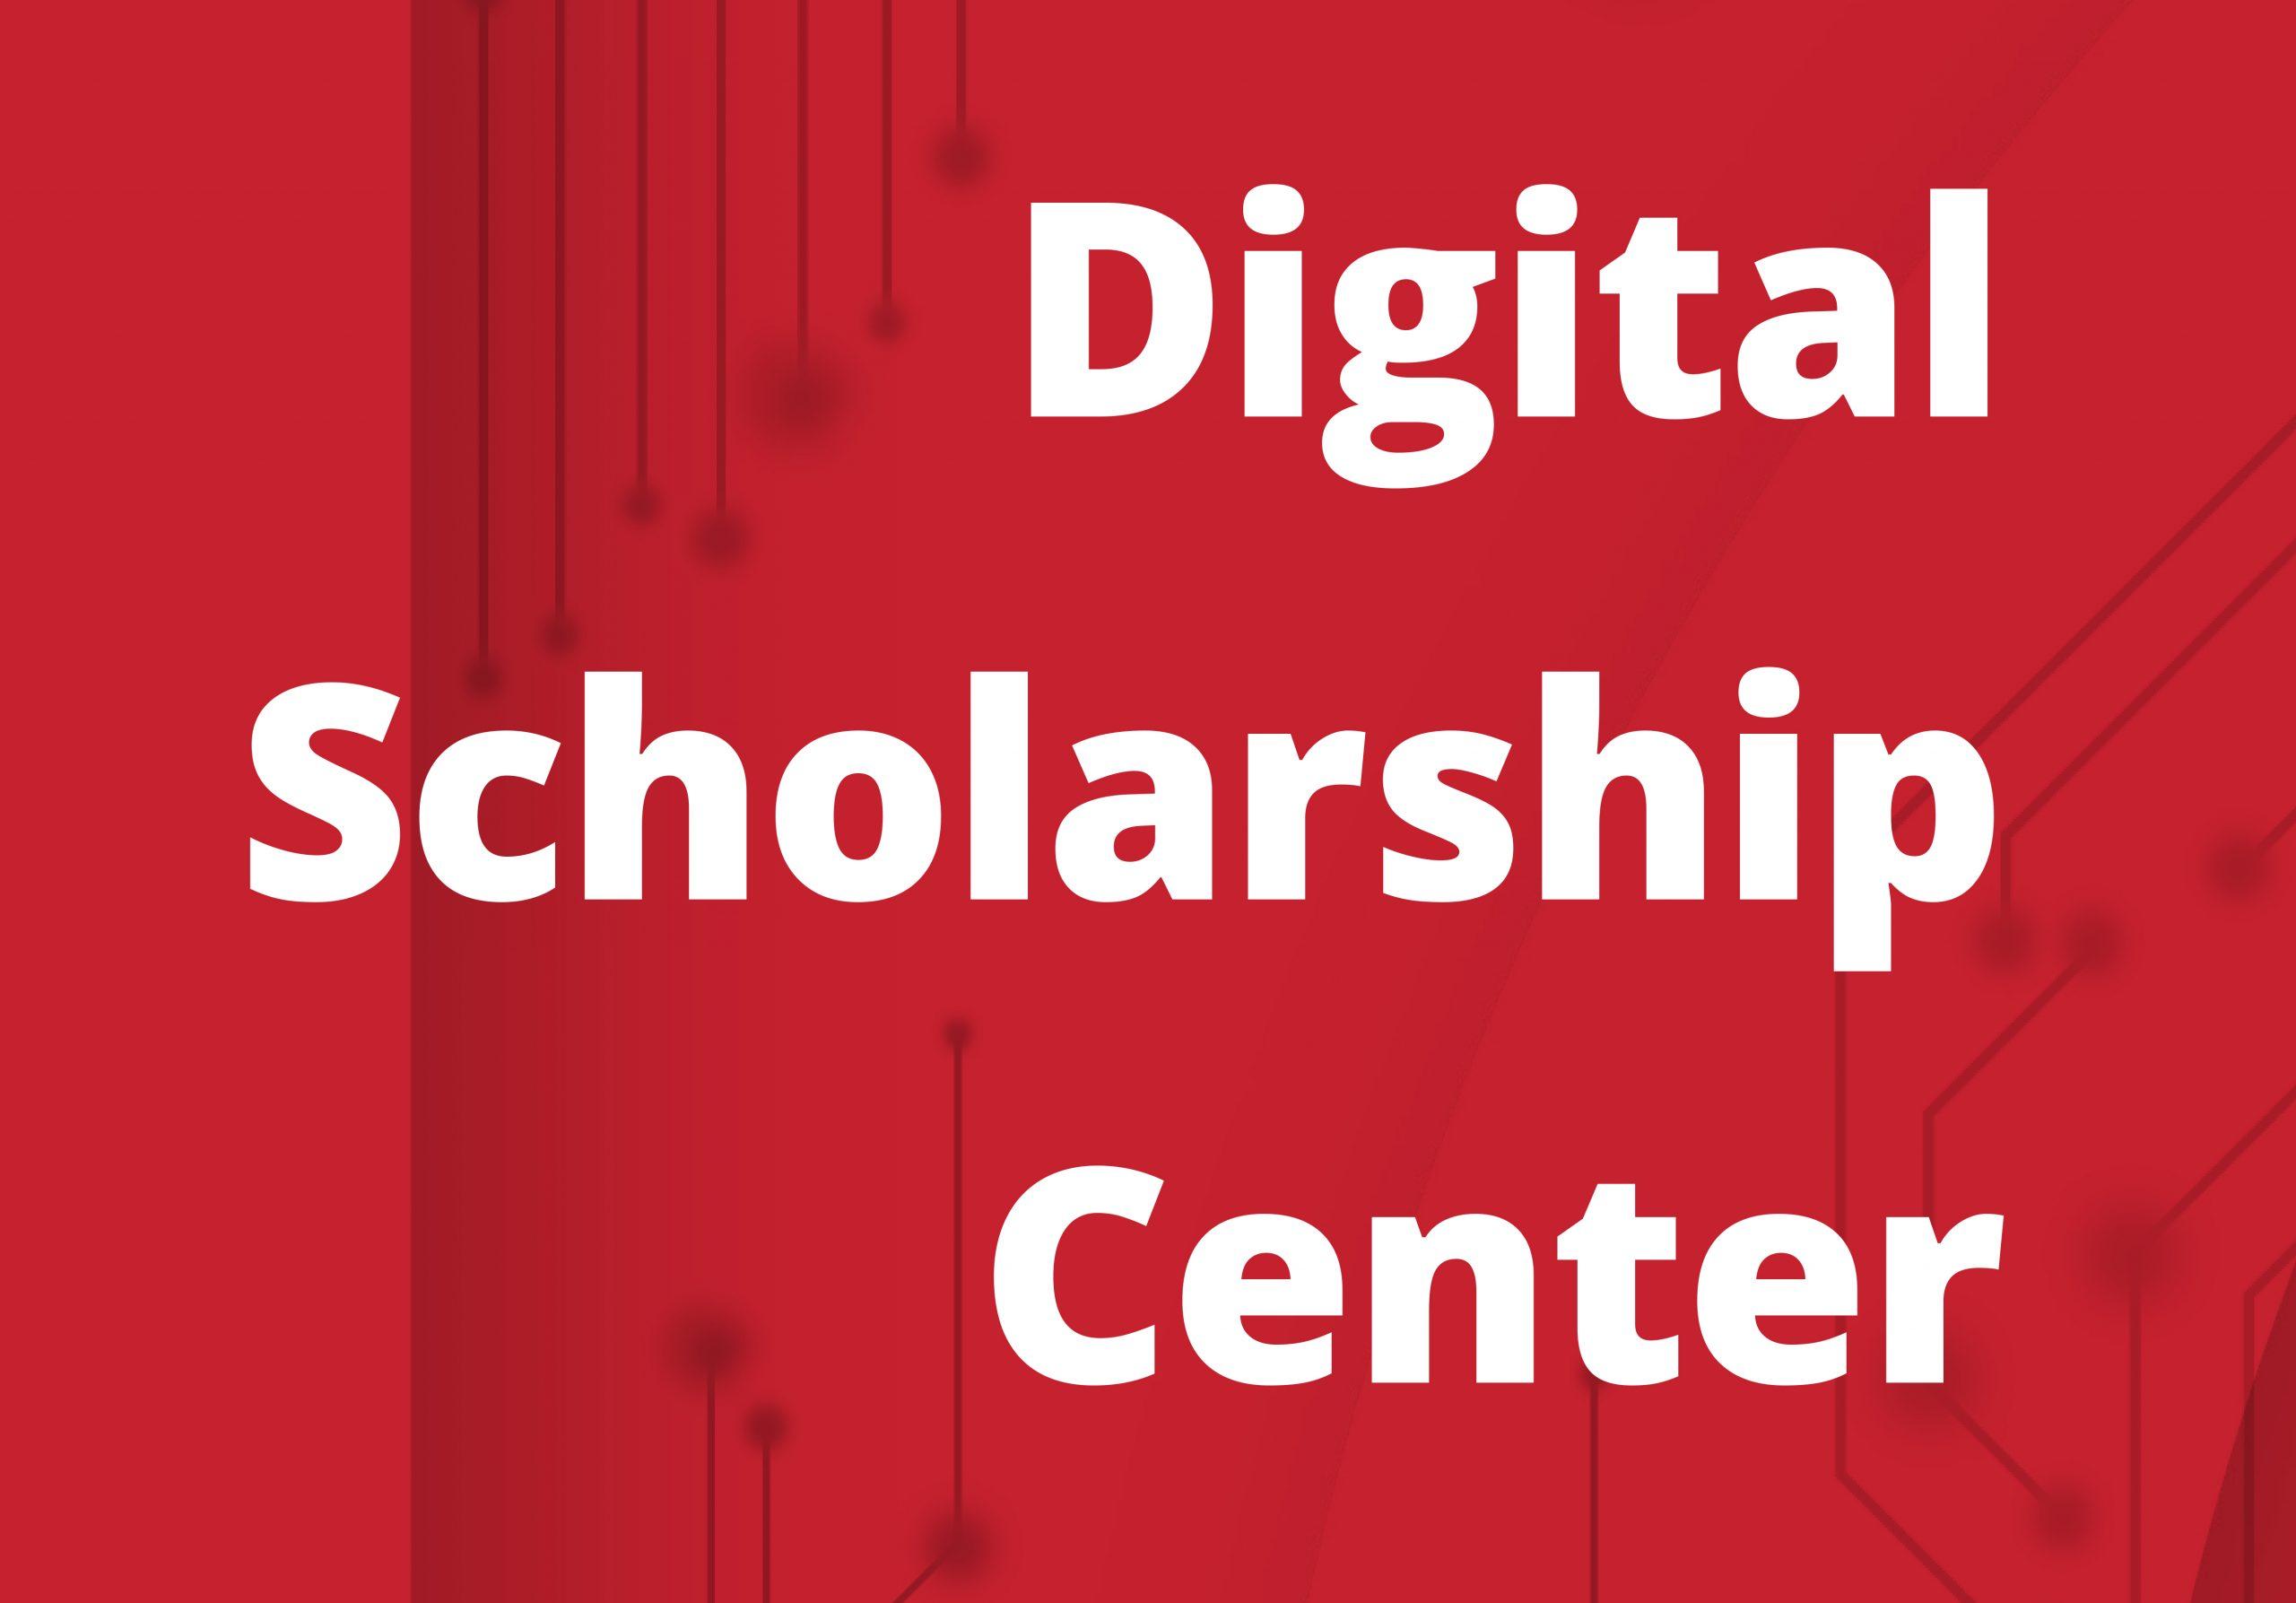 digital scholarship center graphic